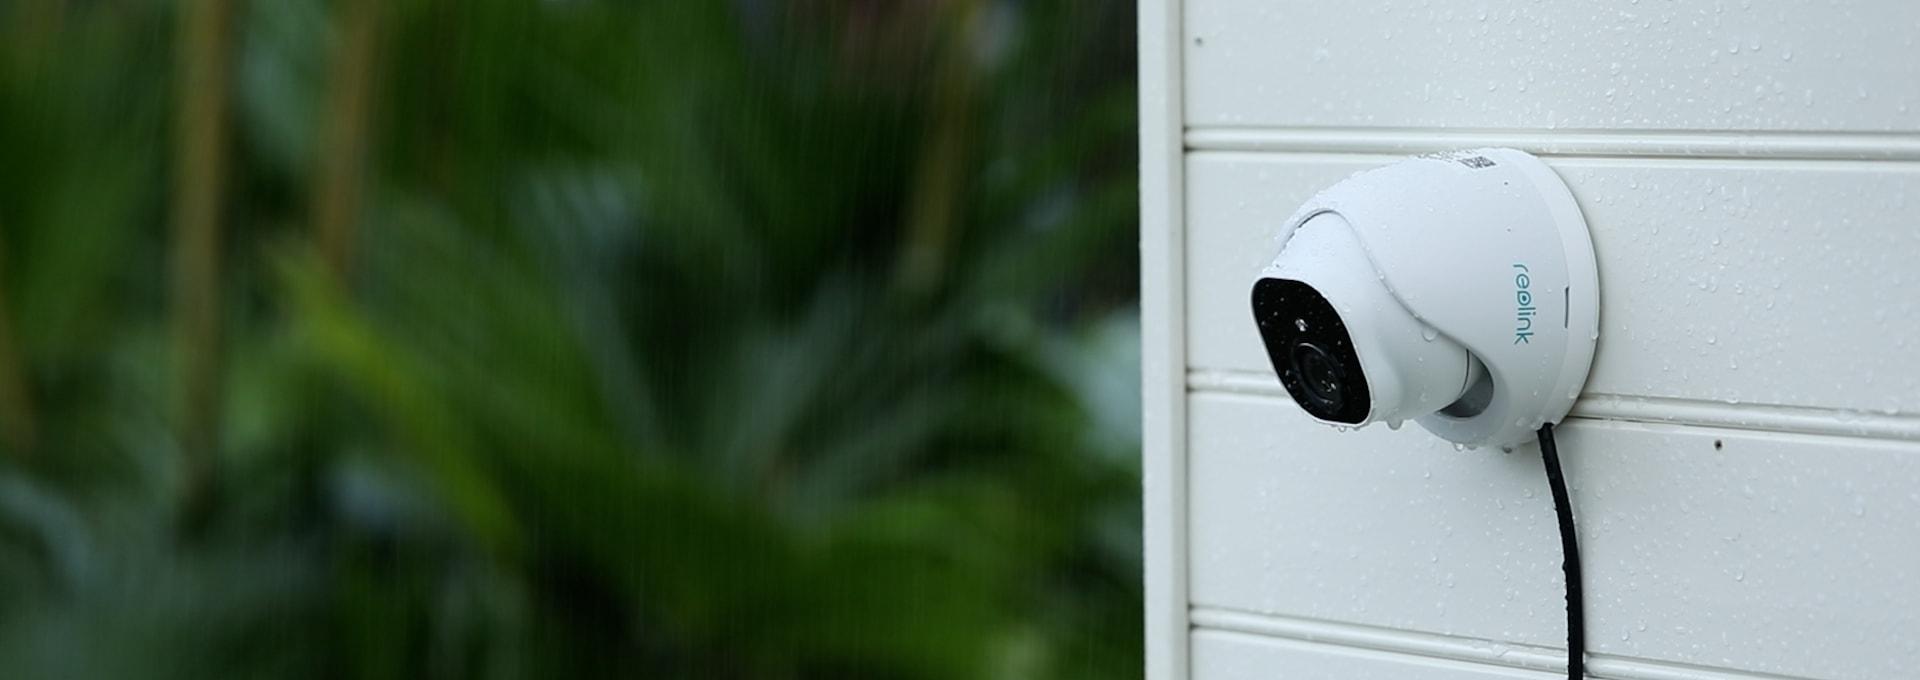 IP66 Weatherproof RLK8-800D4 4K Security Camera System